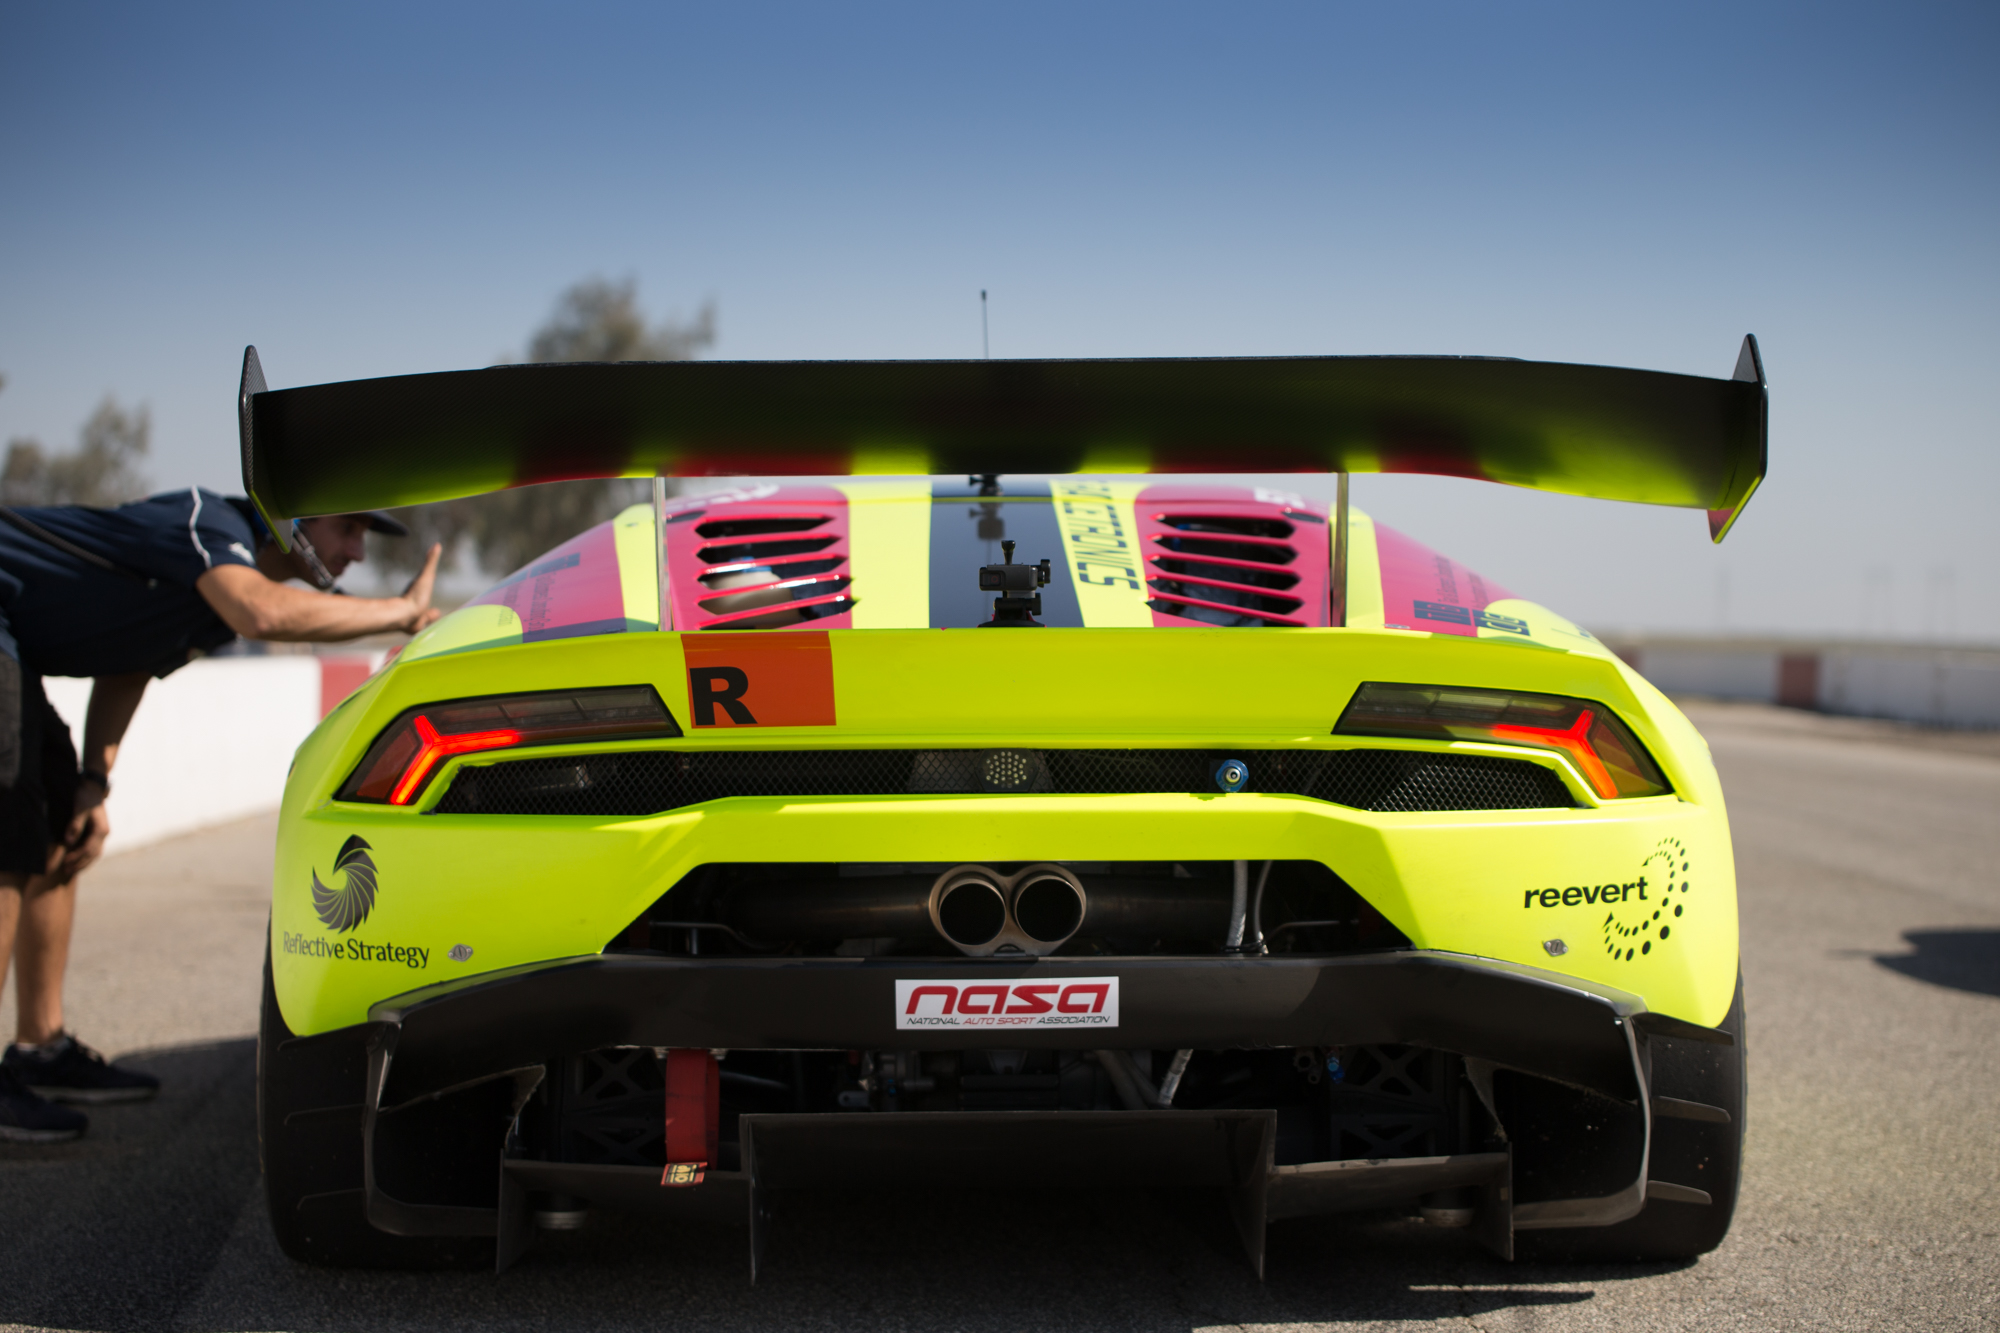 Steven-Racing-20171027-53658.jpg